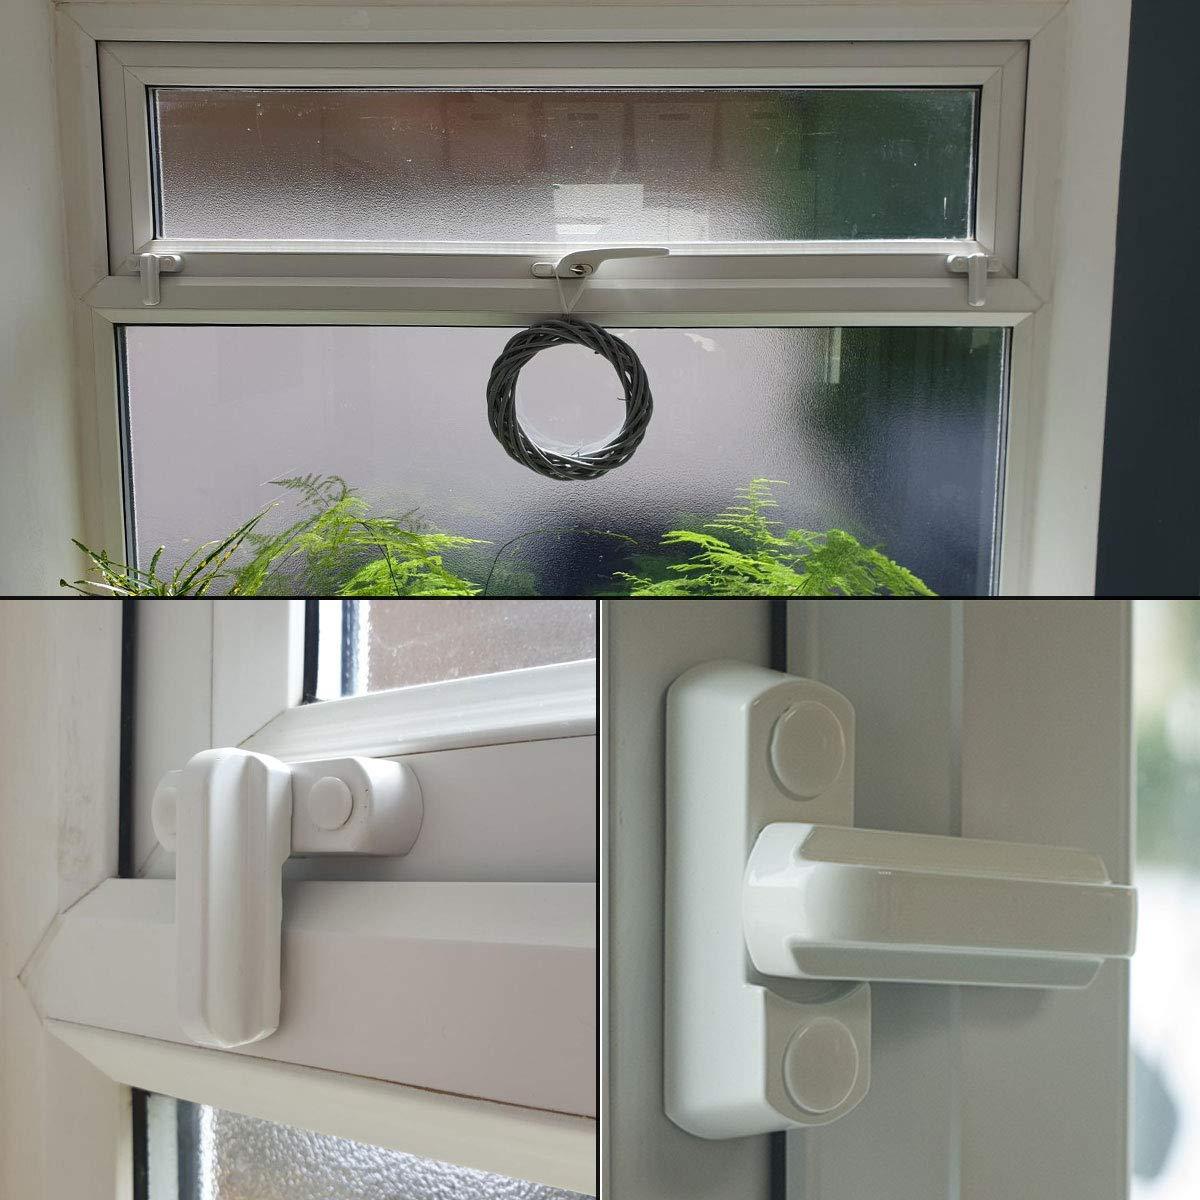 Zinc Cast Alloy Extra Security Lock Sash Blocker ASelected 10 X Sash Jammers Window Locks for Patio Door UPVC PVC Windows Restrictor White